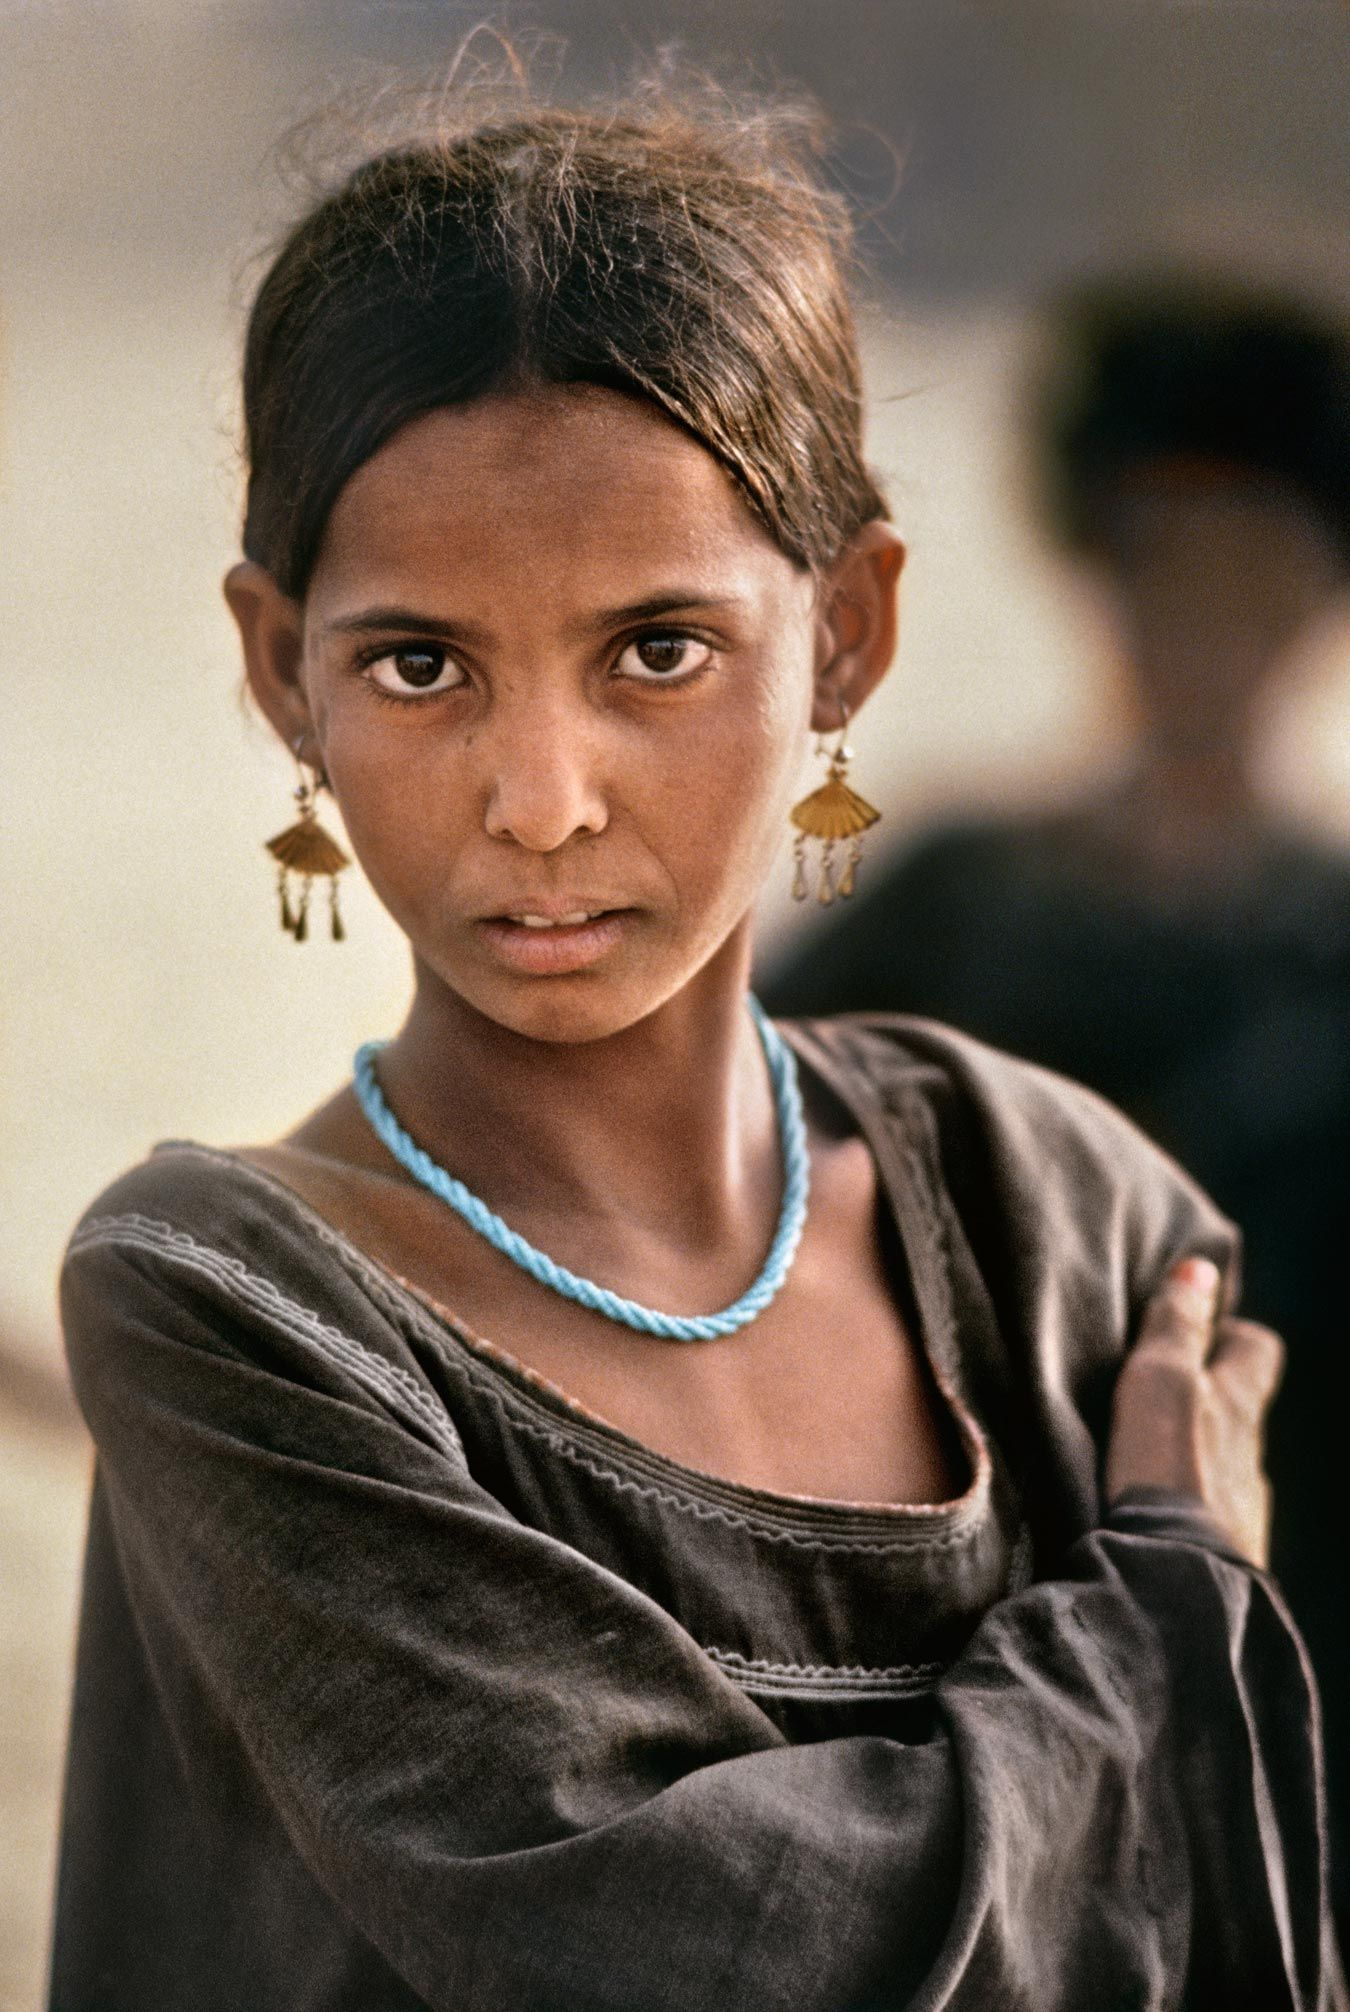 Natalie McCurry